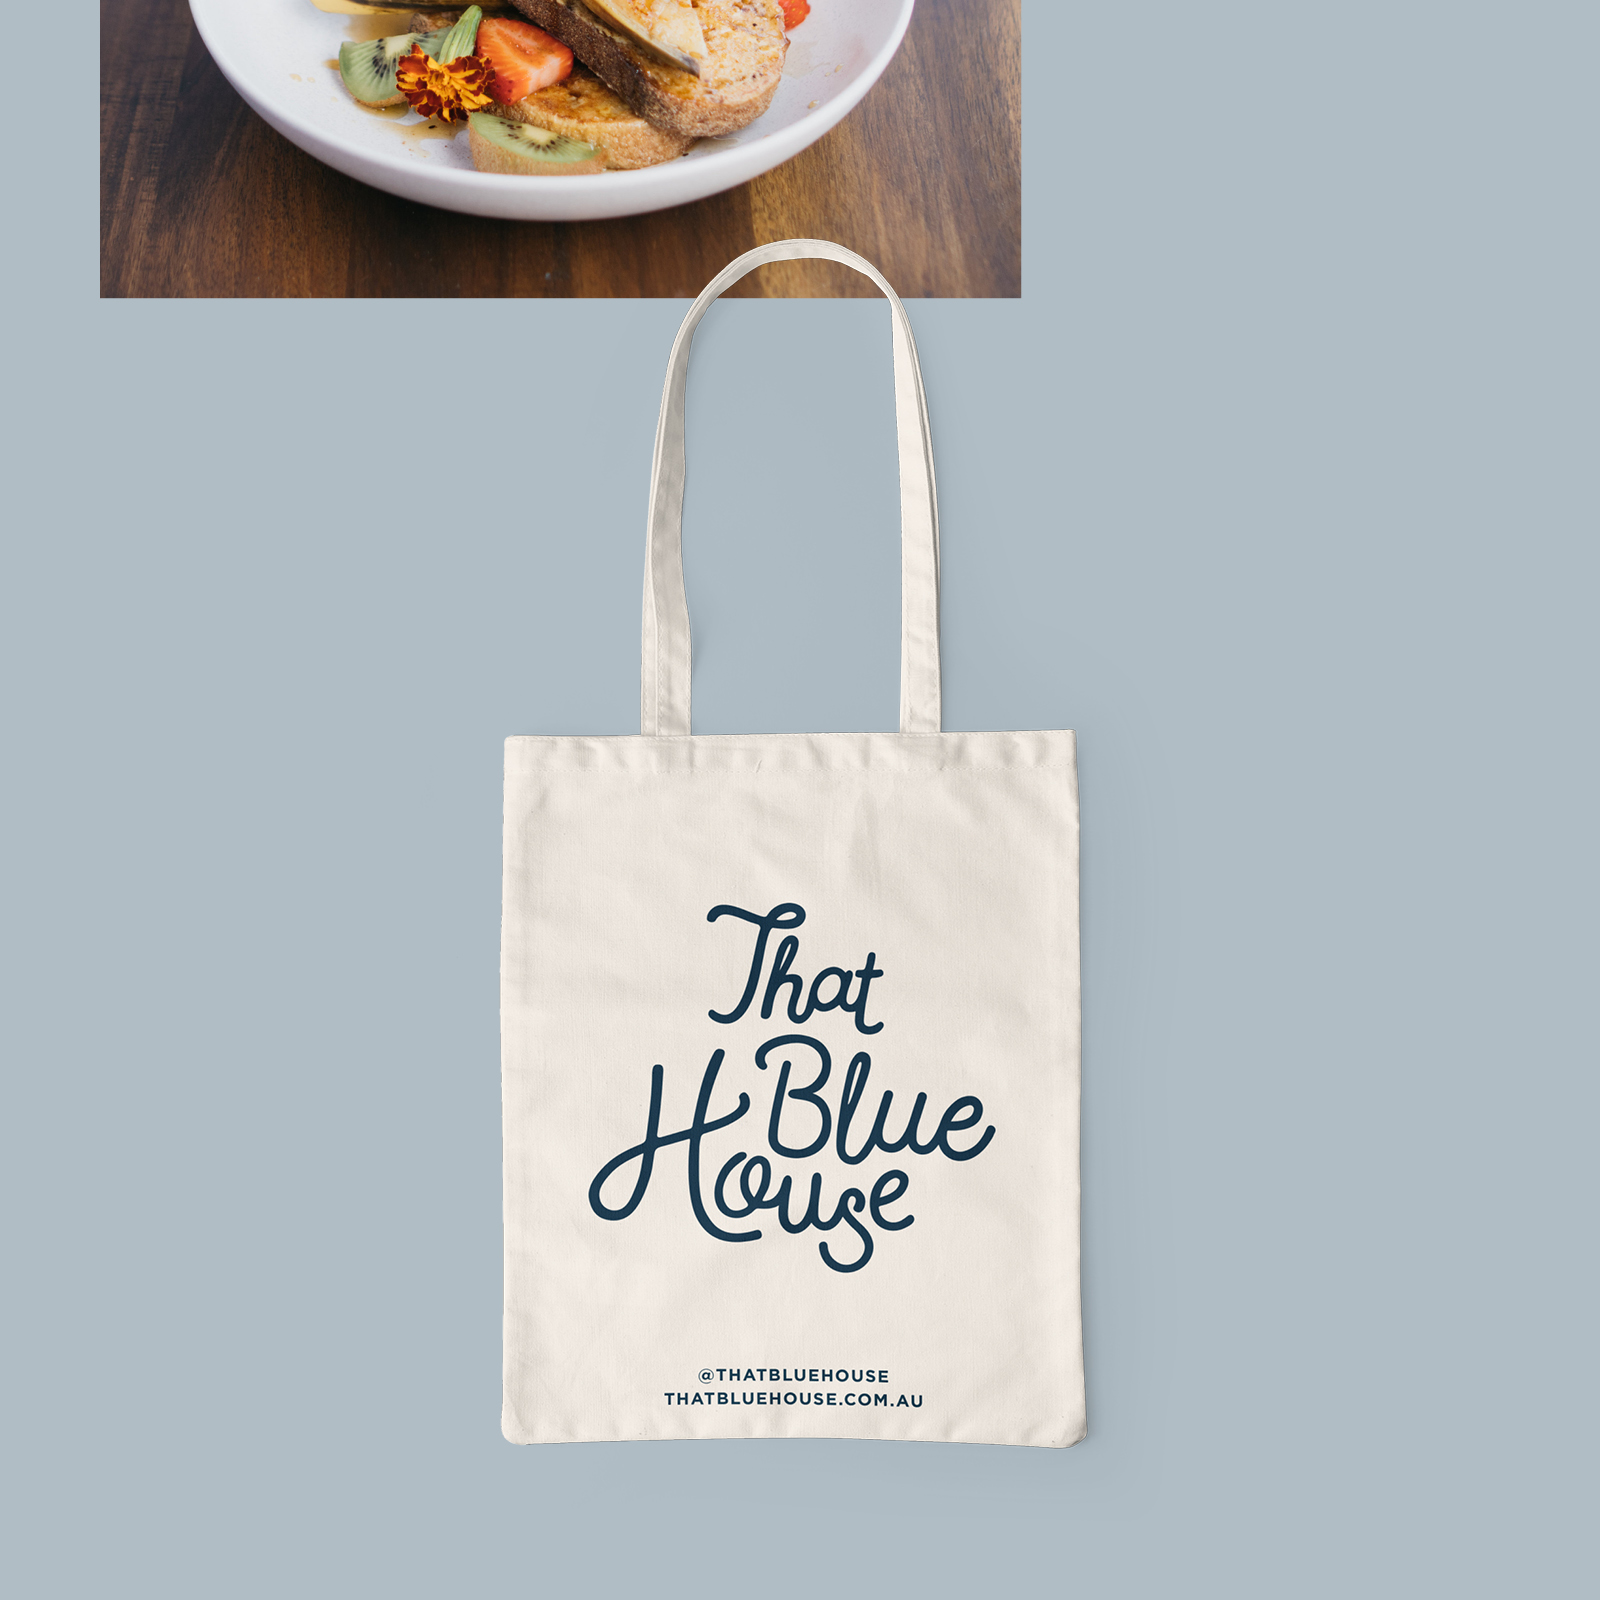 thatbluehouse-project-web11.jpg